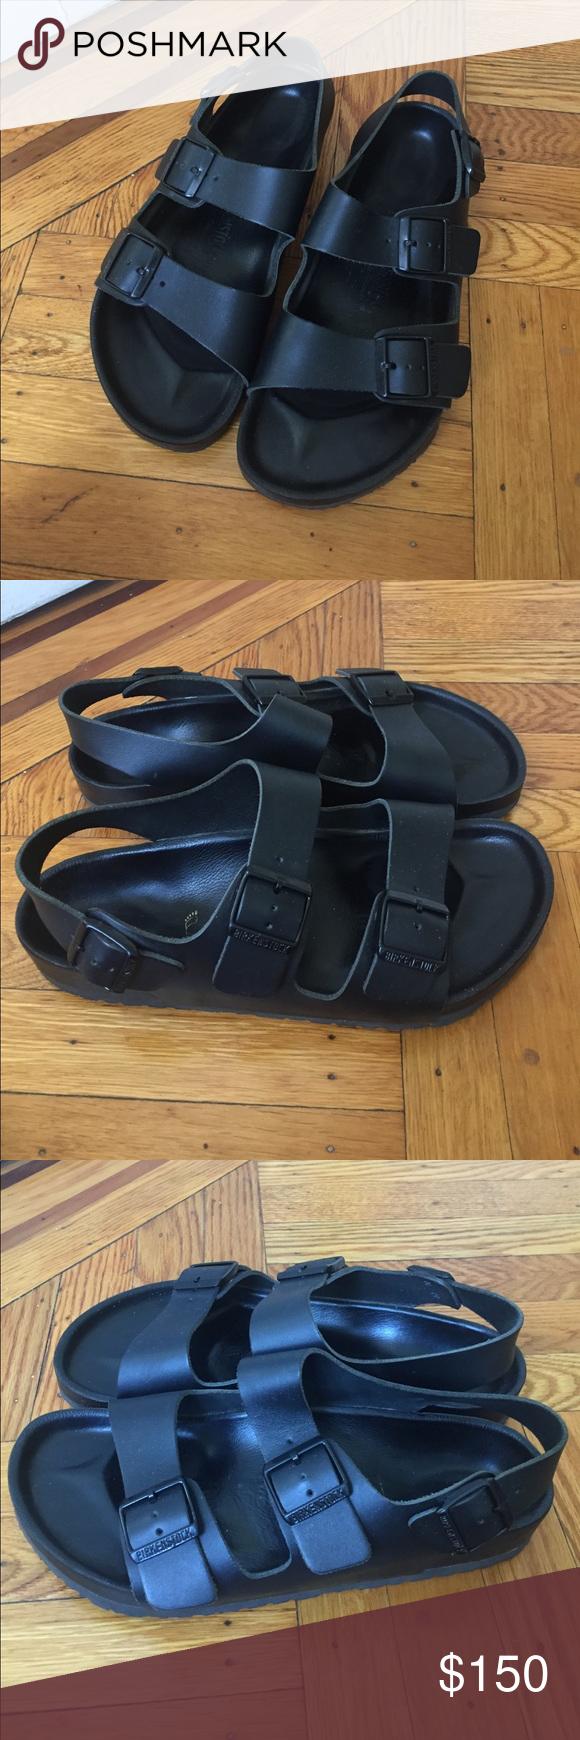 ebdef4d9bff Birkenstock Milano Exquisite Black Leather Size 42. Only worn about 10  times. Birkenstock Shoes Sandals   Flip-Flops